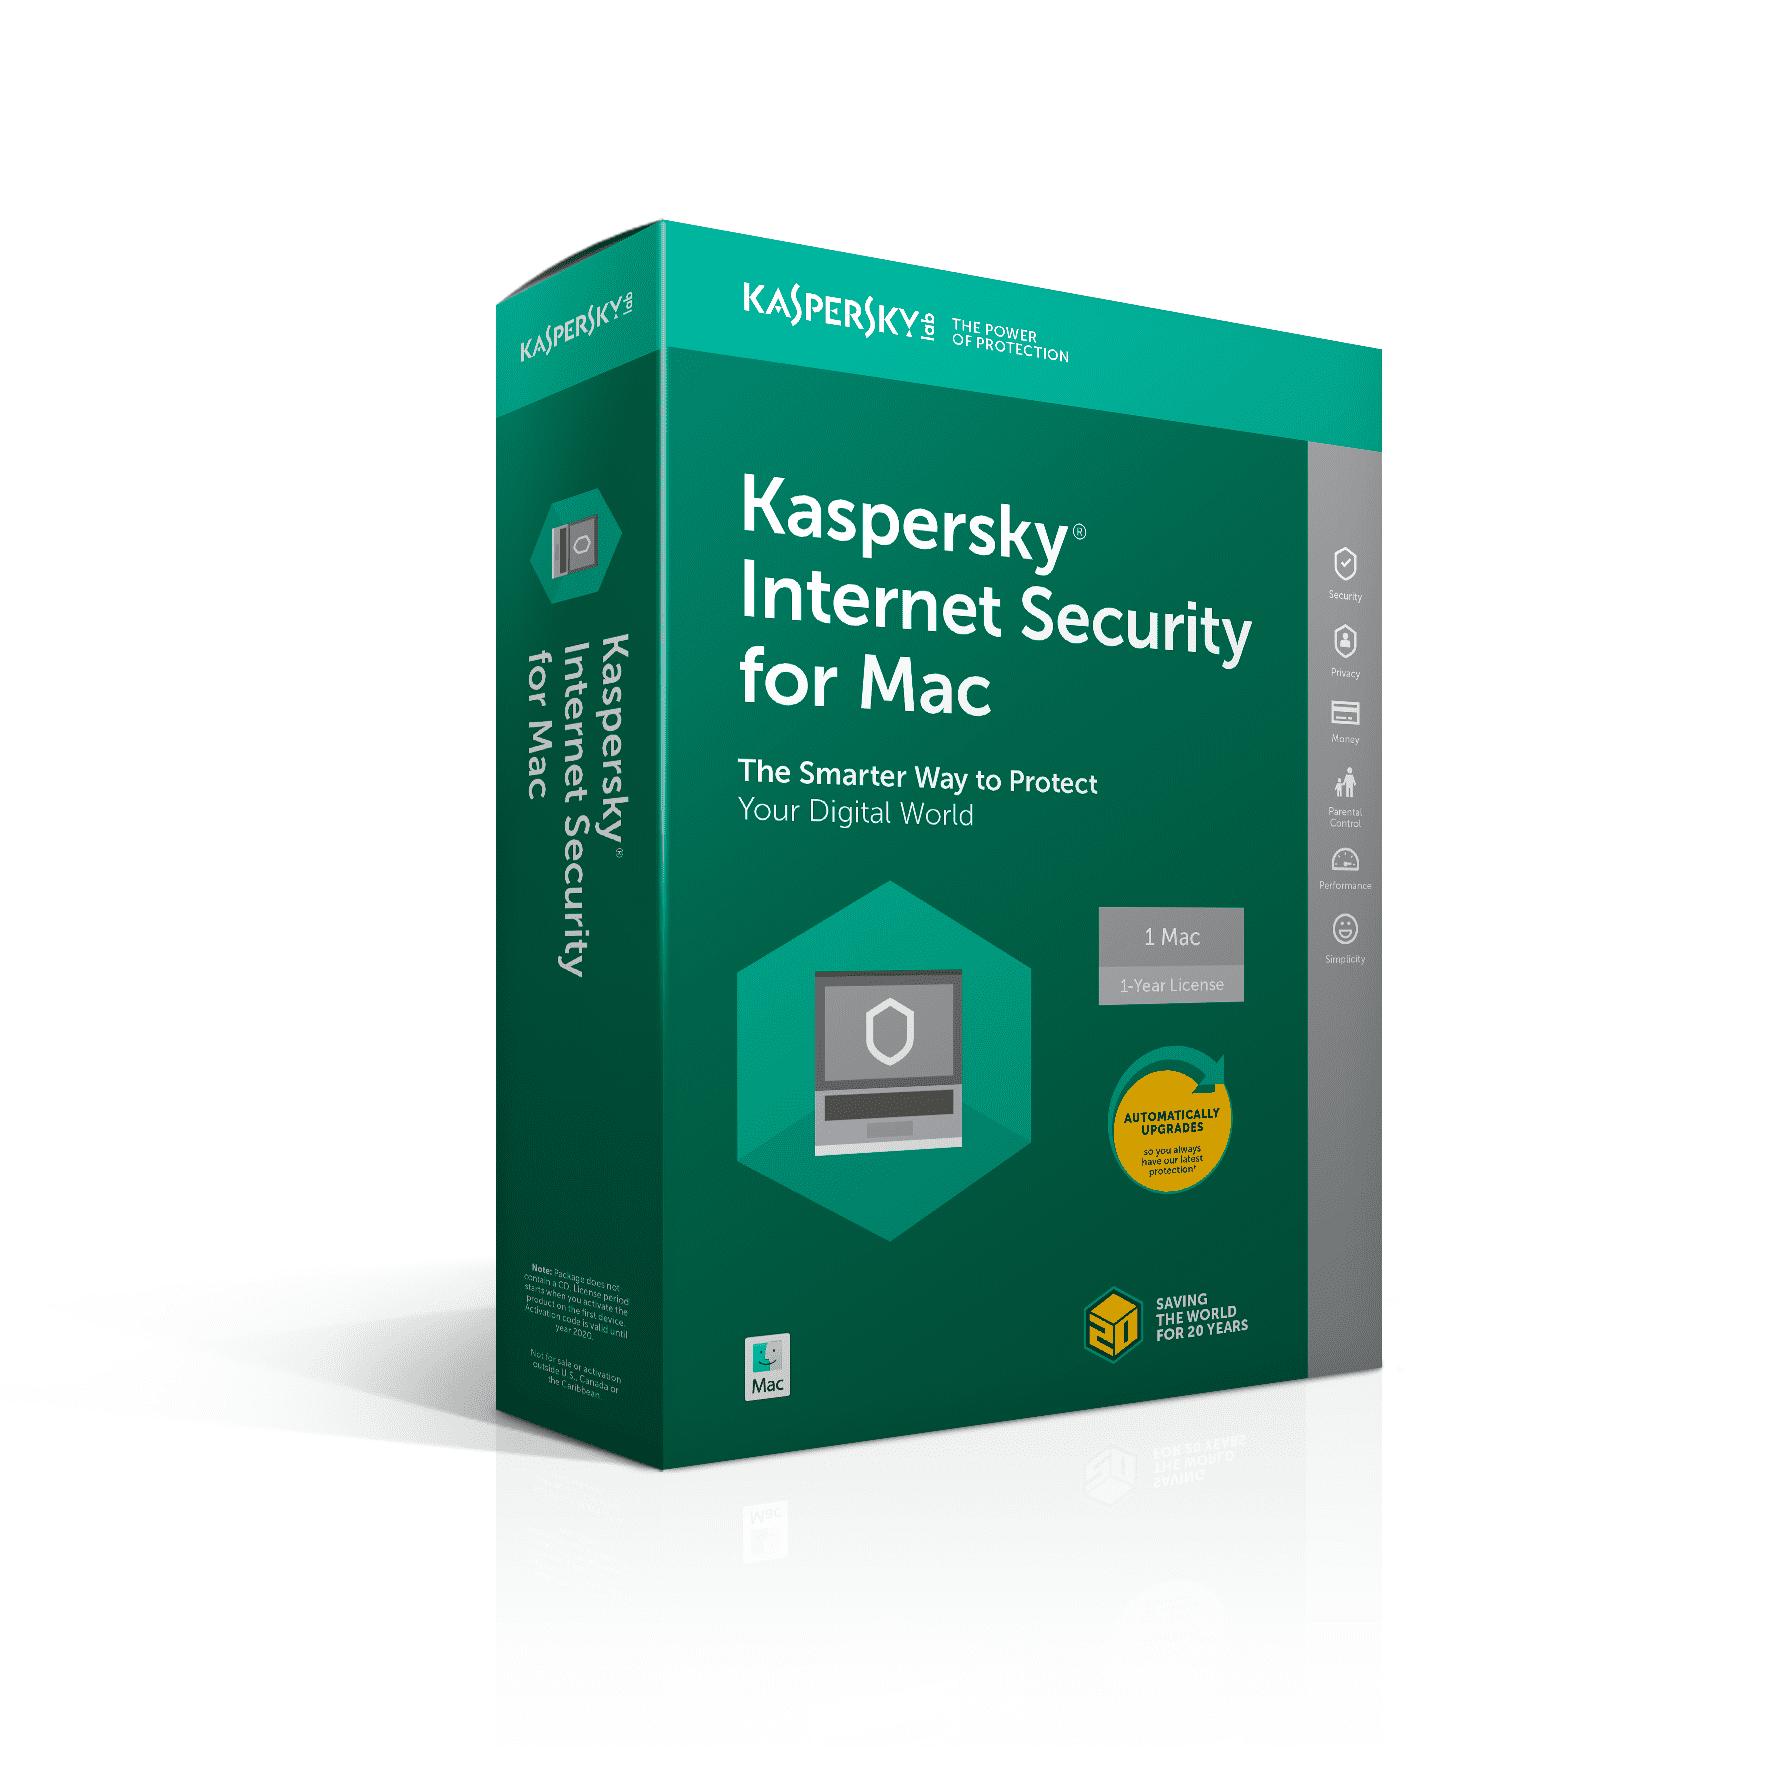 Kaspersky Internet Security for Mac screenshot